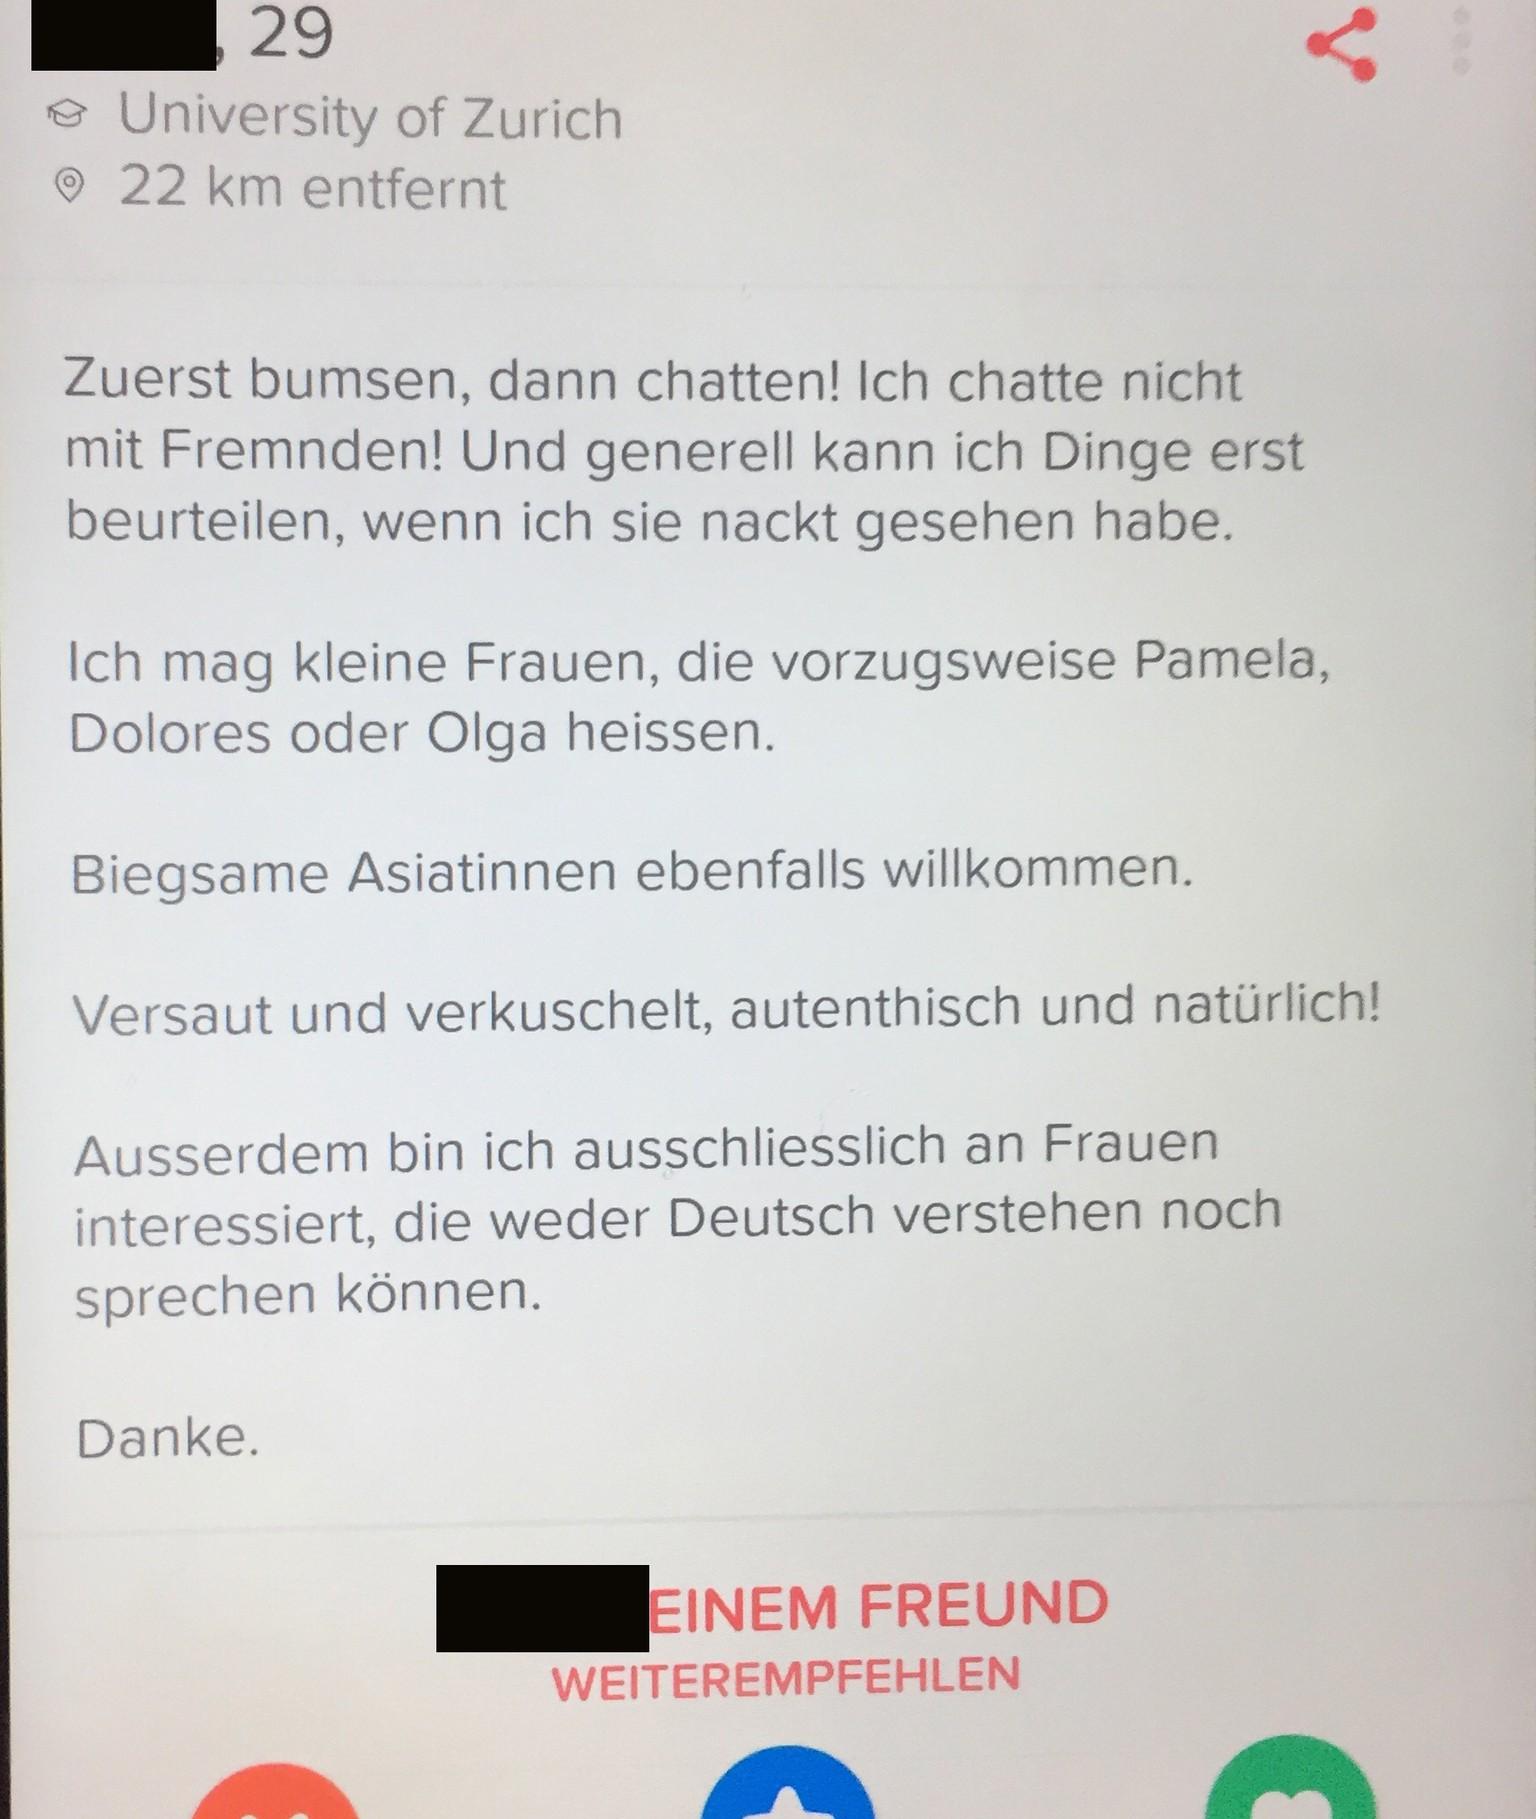 gratis Dating in der Schweiz